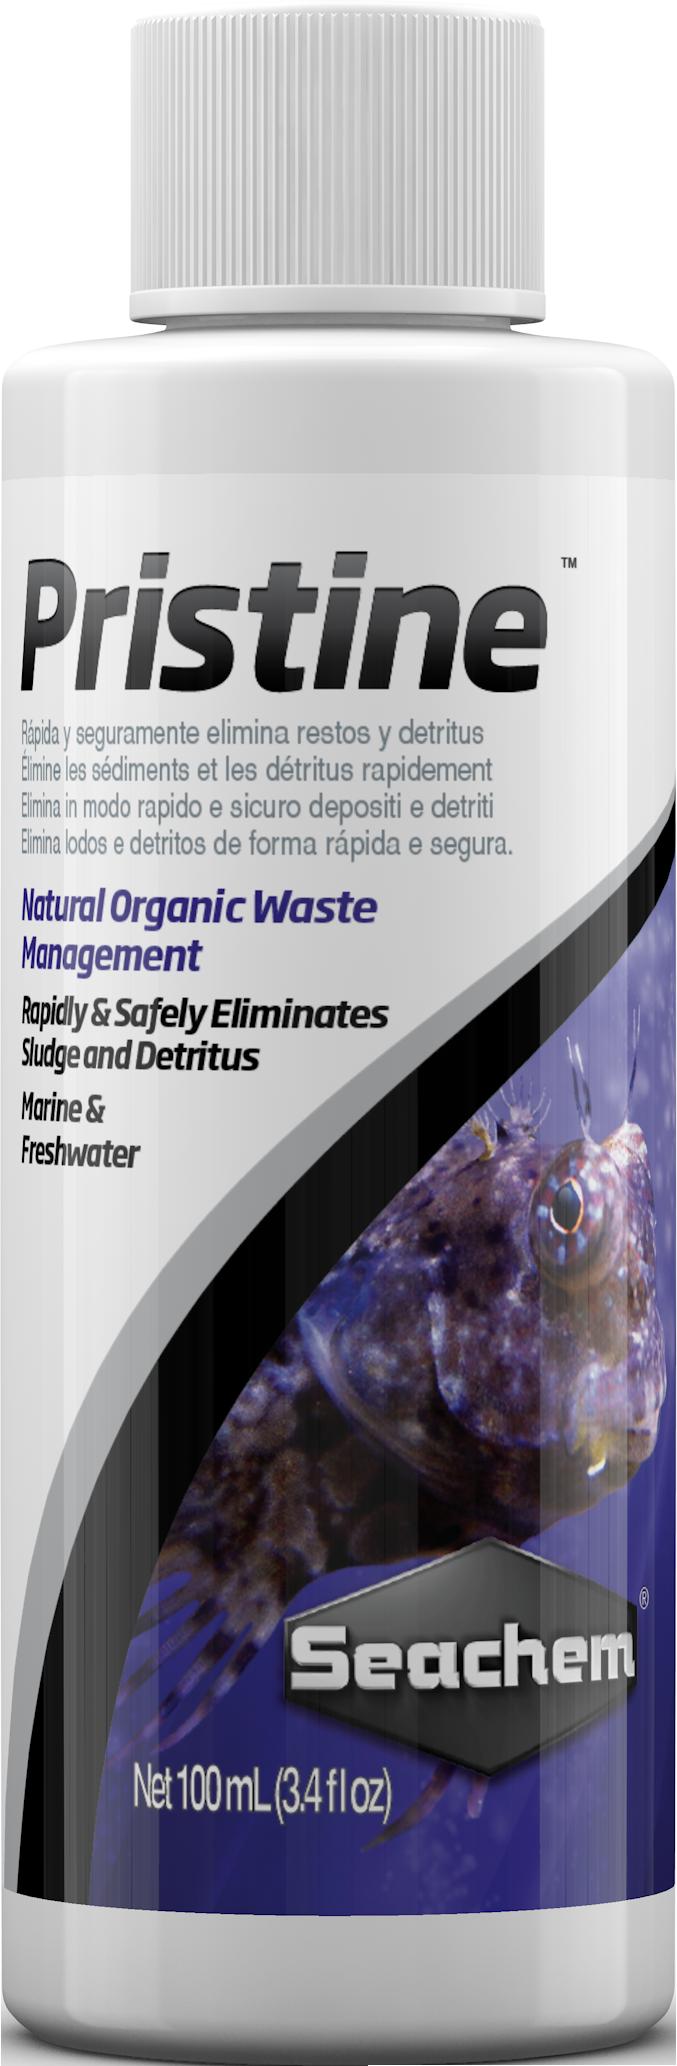 Pristine-100%20mL